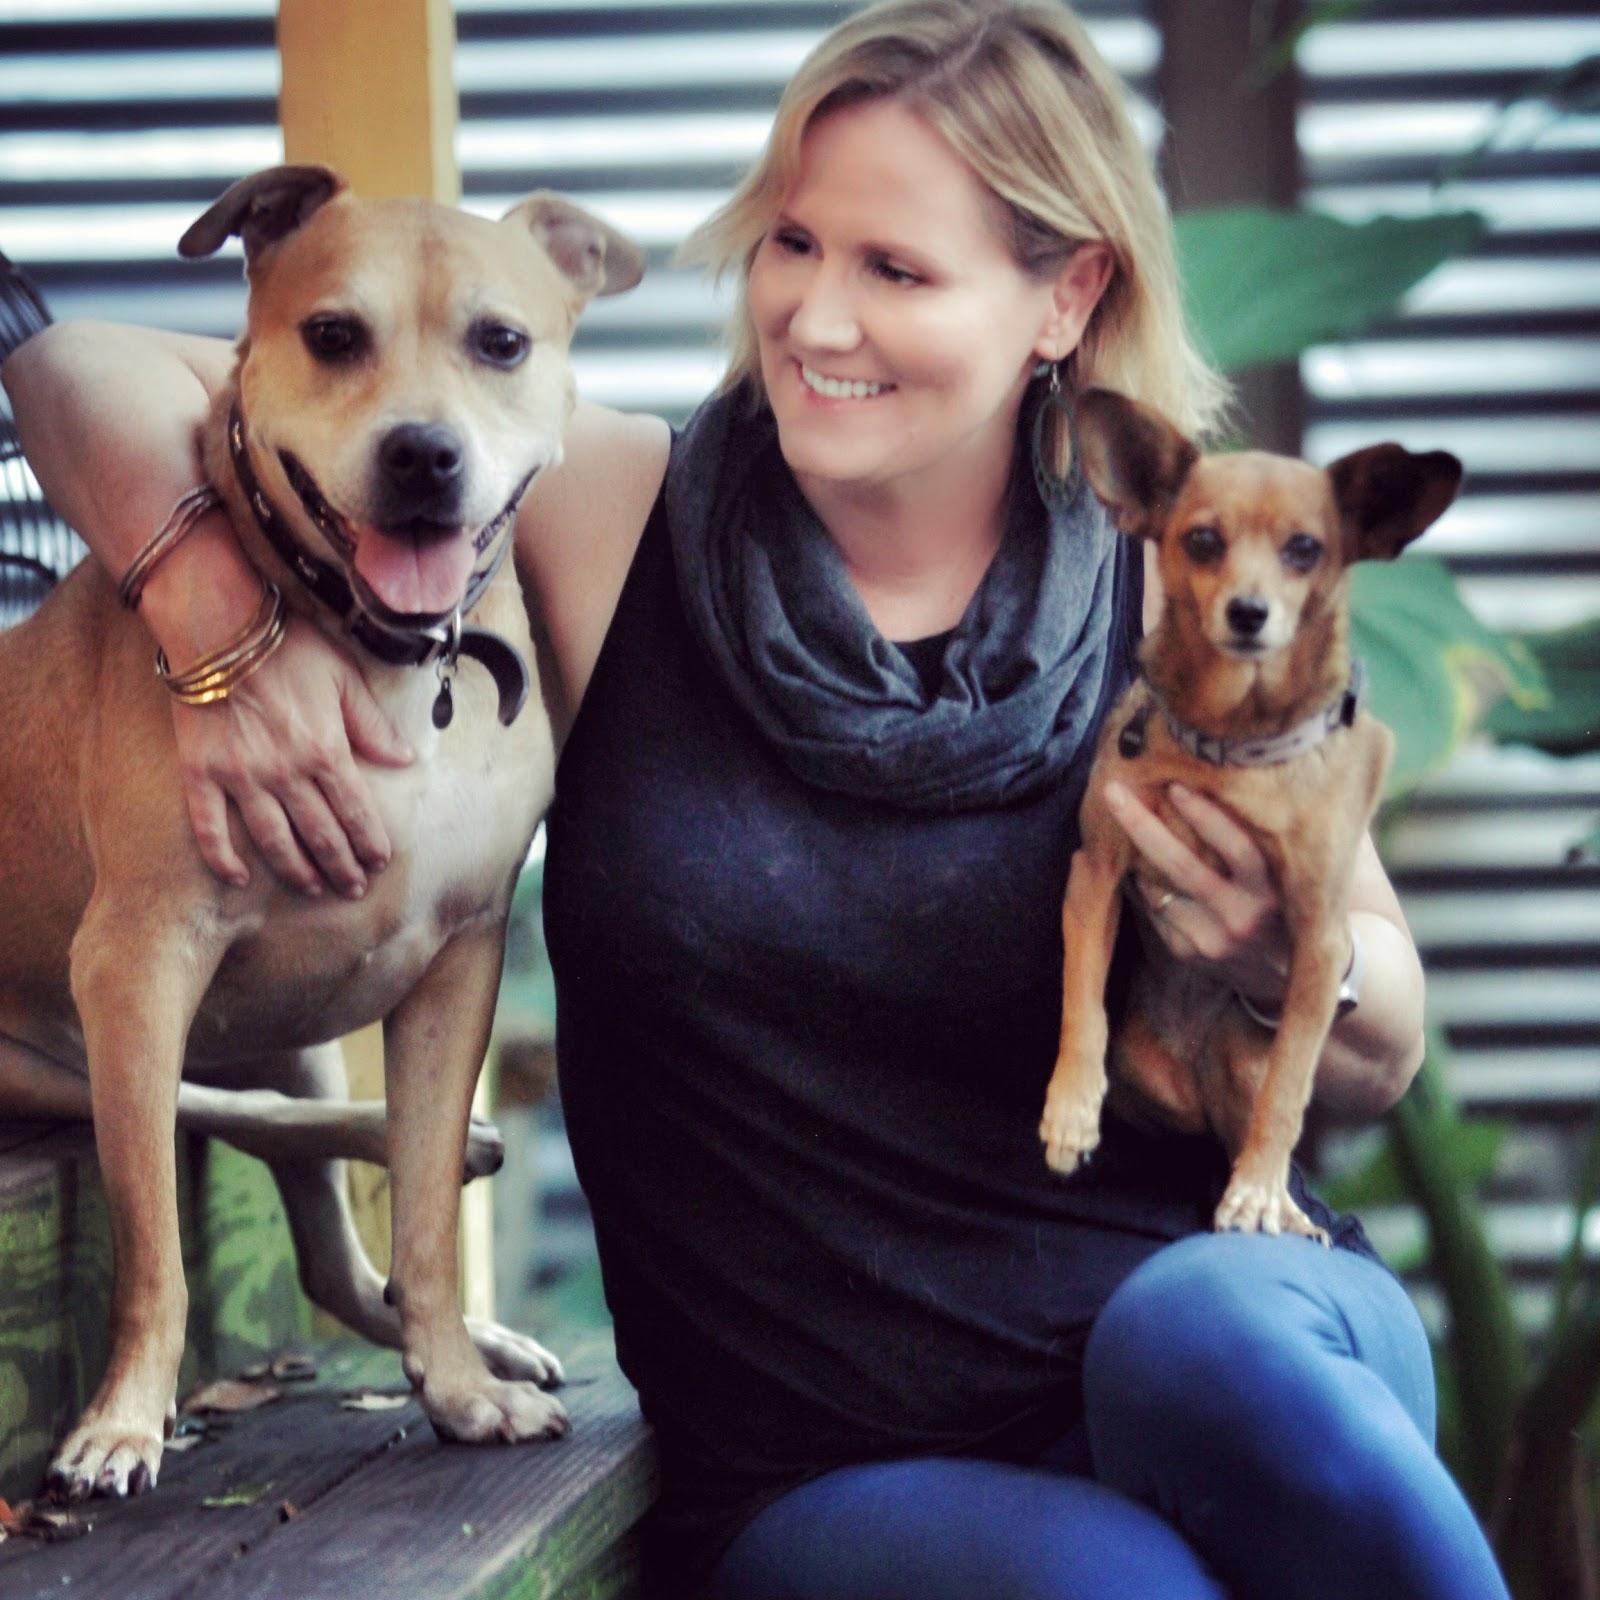 Photo: Jennifer John wearing a    Pang Wangle    scarf and pants with dogs Dicey and Jane